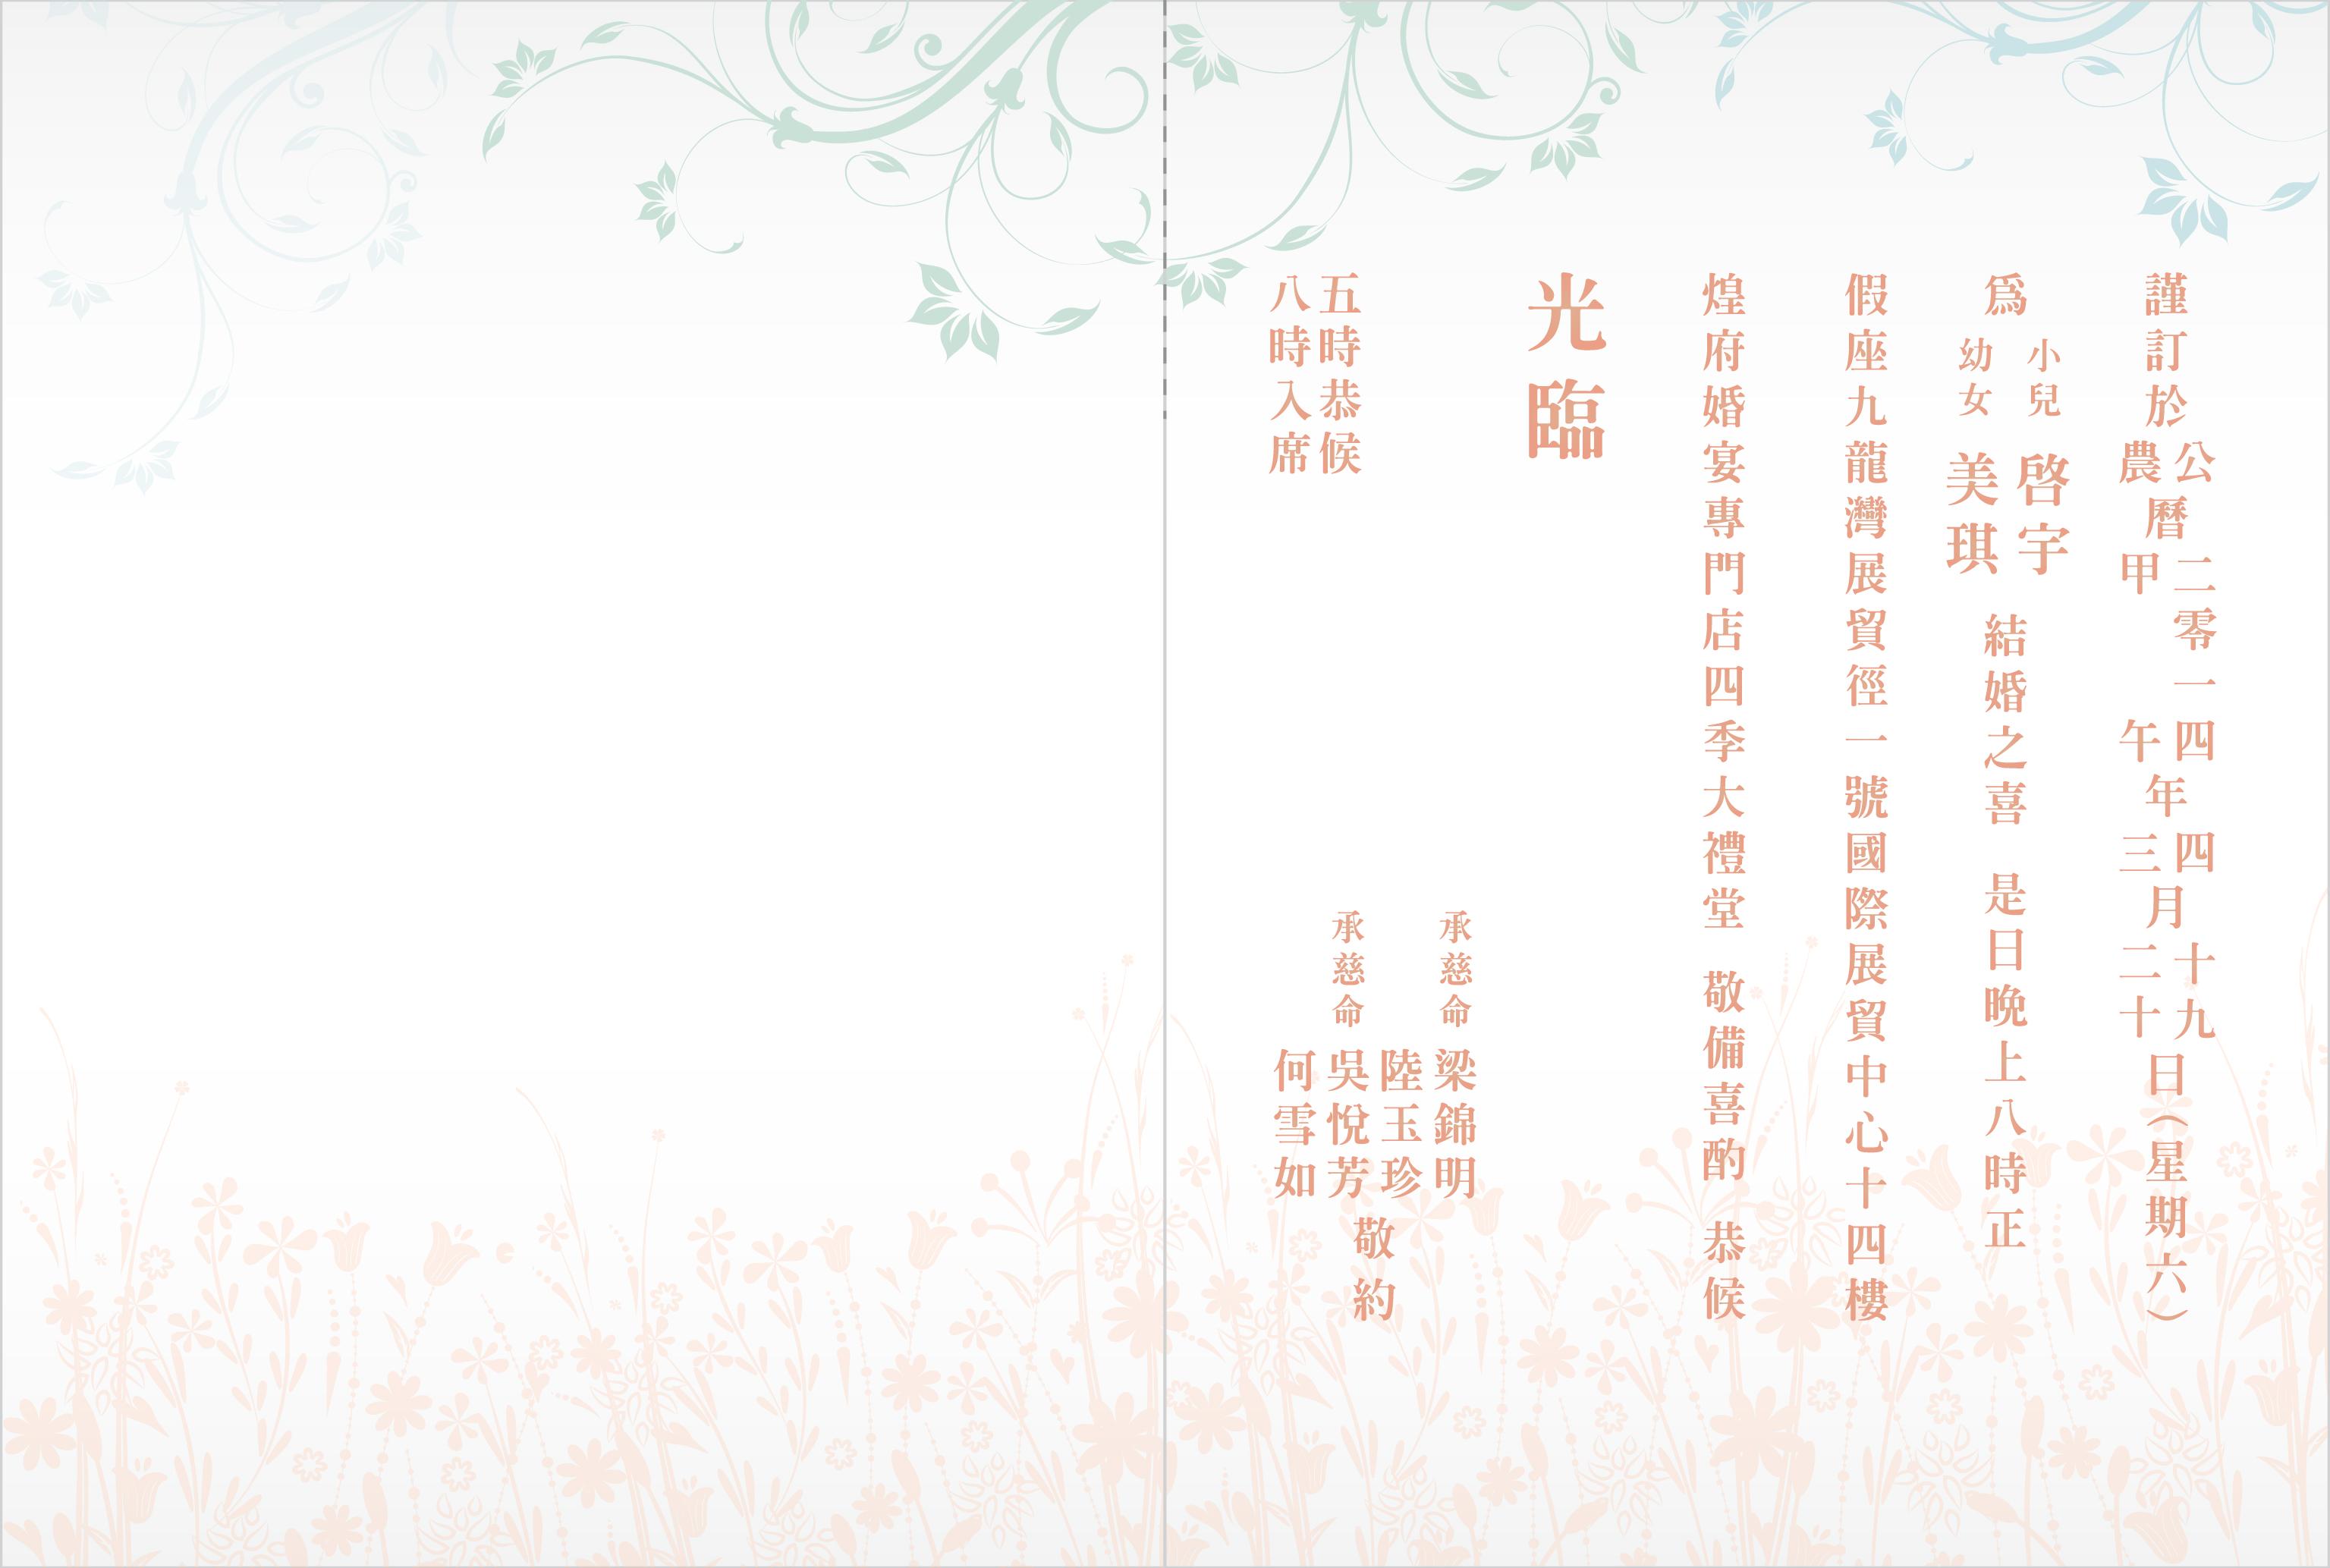 M_Y_DinnerInvCardv5_Cover copy 3